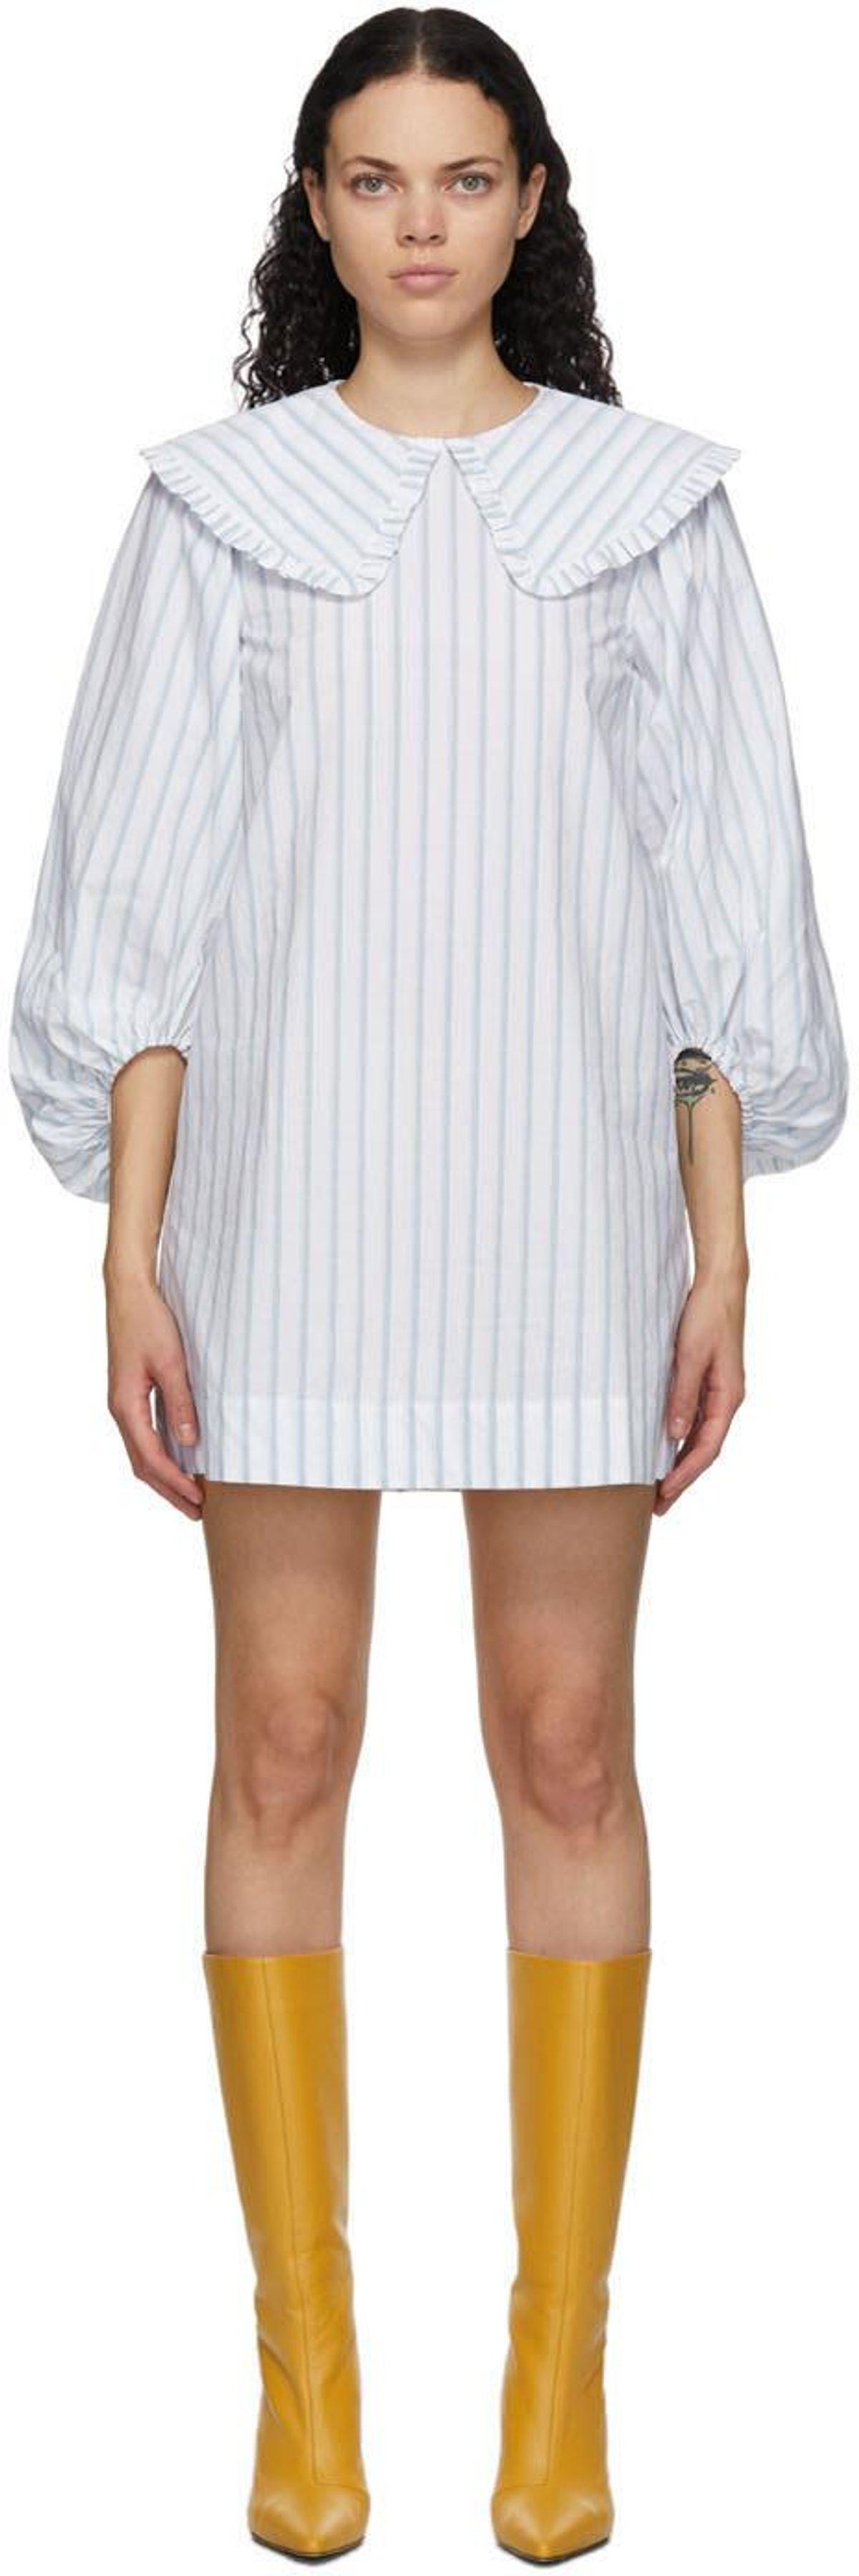 Striped Balloon Sleeve Dress